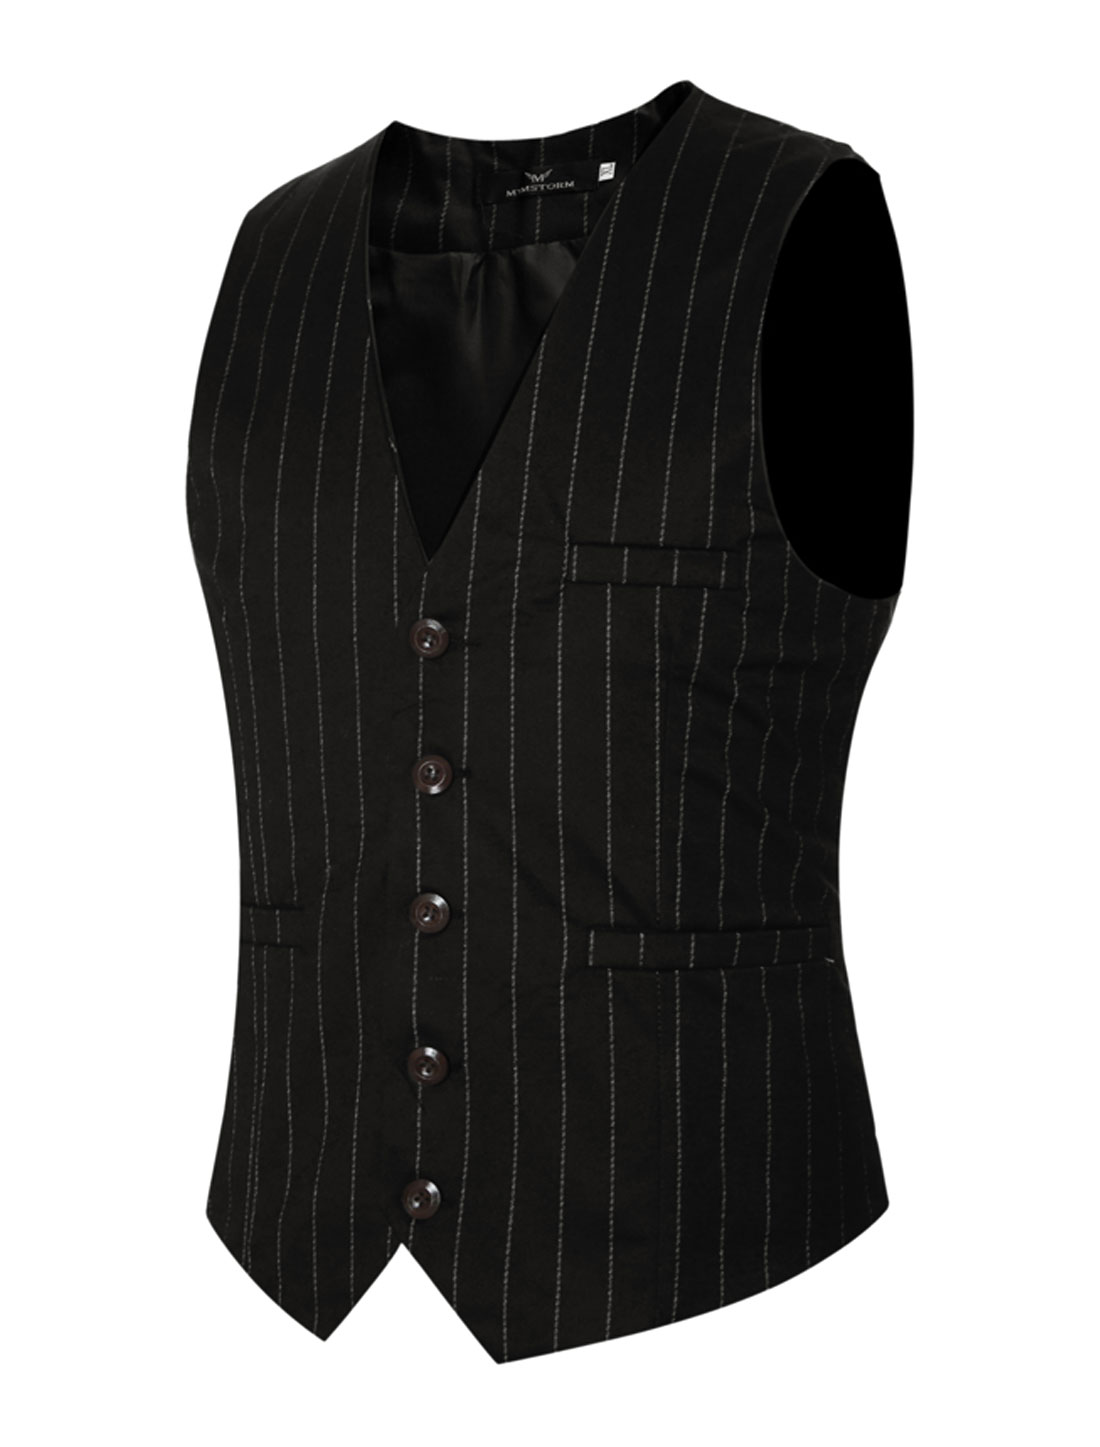 Men Adjustable Self Tie Slim Fit V Neck Button Up Striped Waistcoat Black M